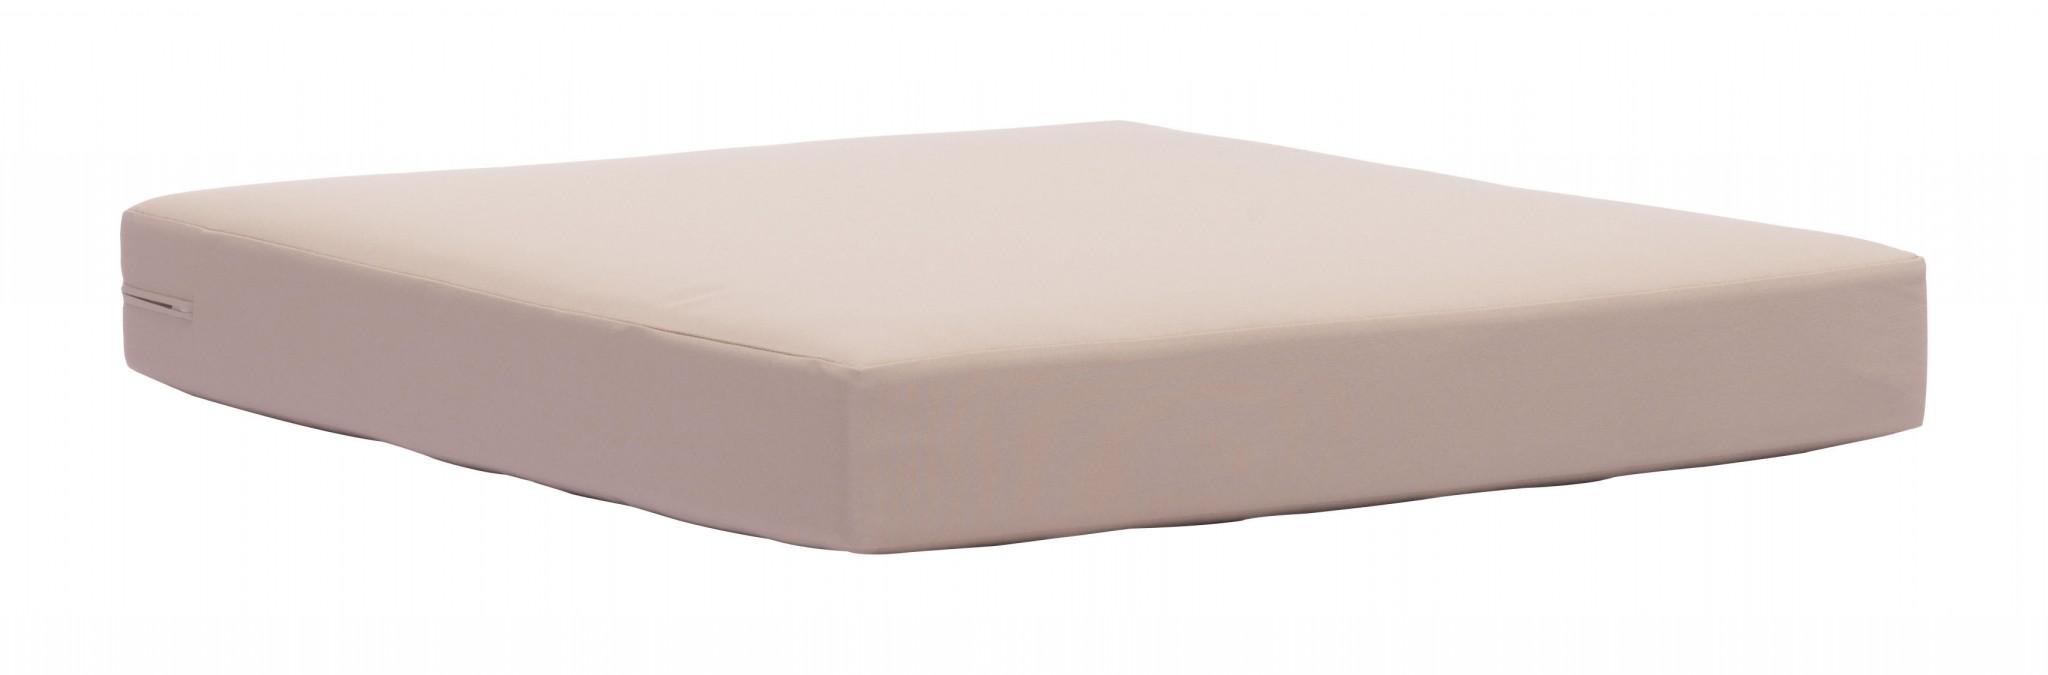 "30.3"" x 30.3"" x 3.9"" Taupe, Sunproof Fabric, Foam, Beach Seat Cushion"